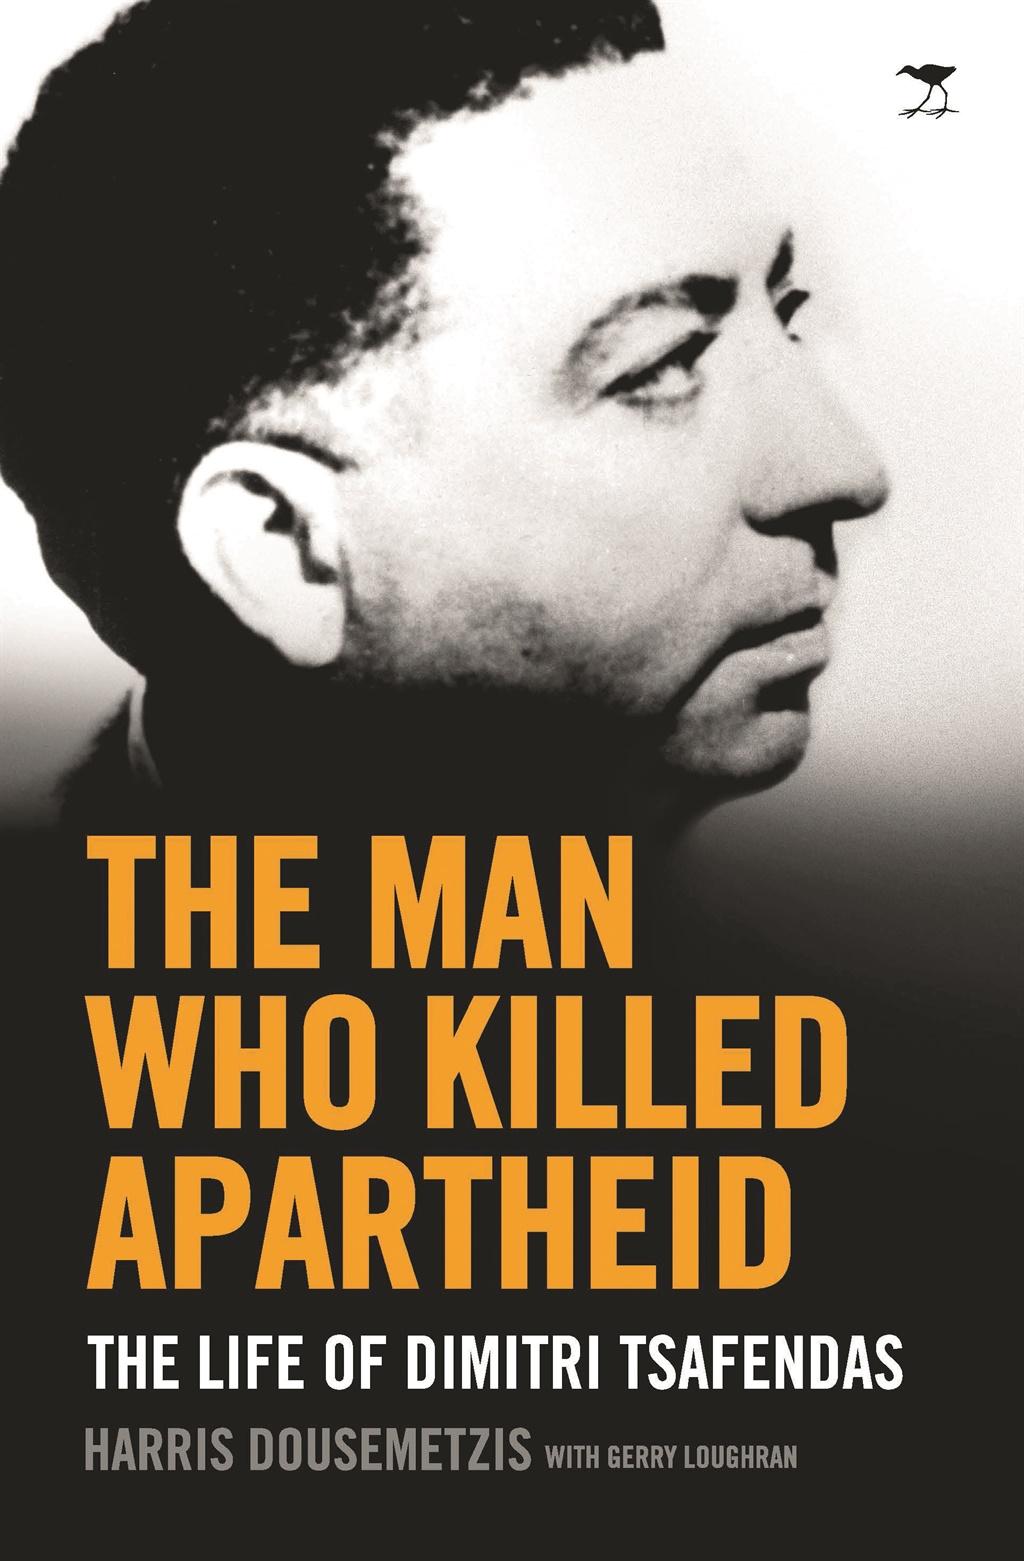 The Man Who Killed Apartheid: The Life of Dimitri Tsafendas, by Harris Dousemetzis, published by Jacana Media.